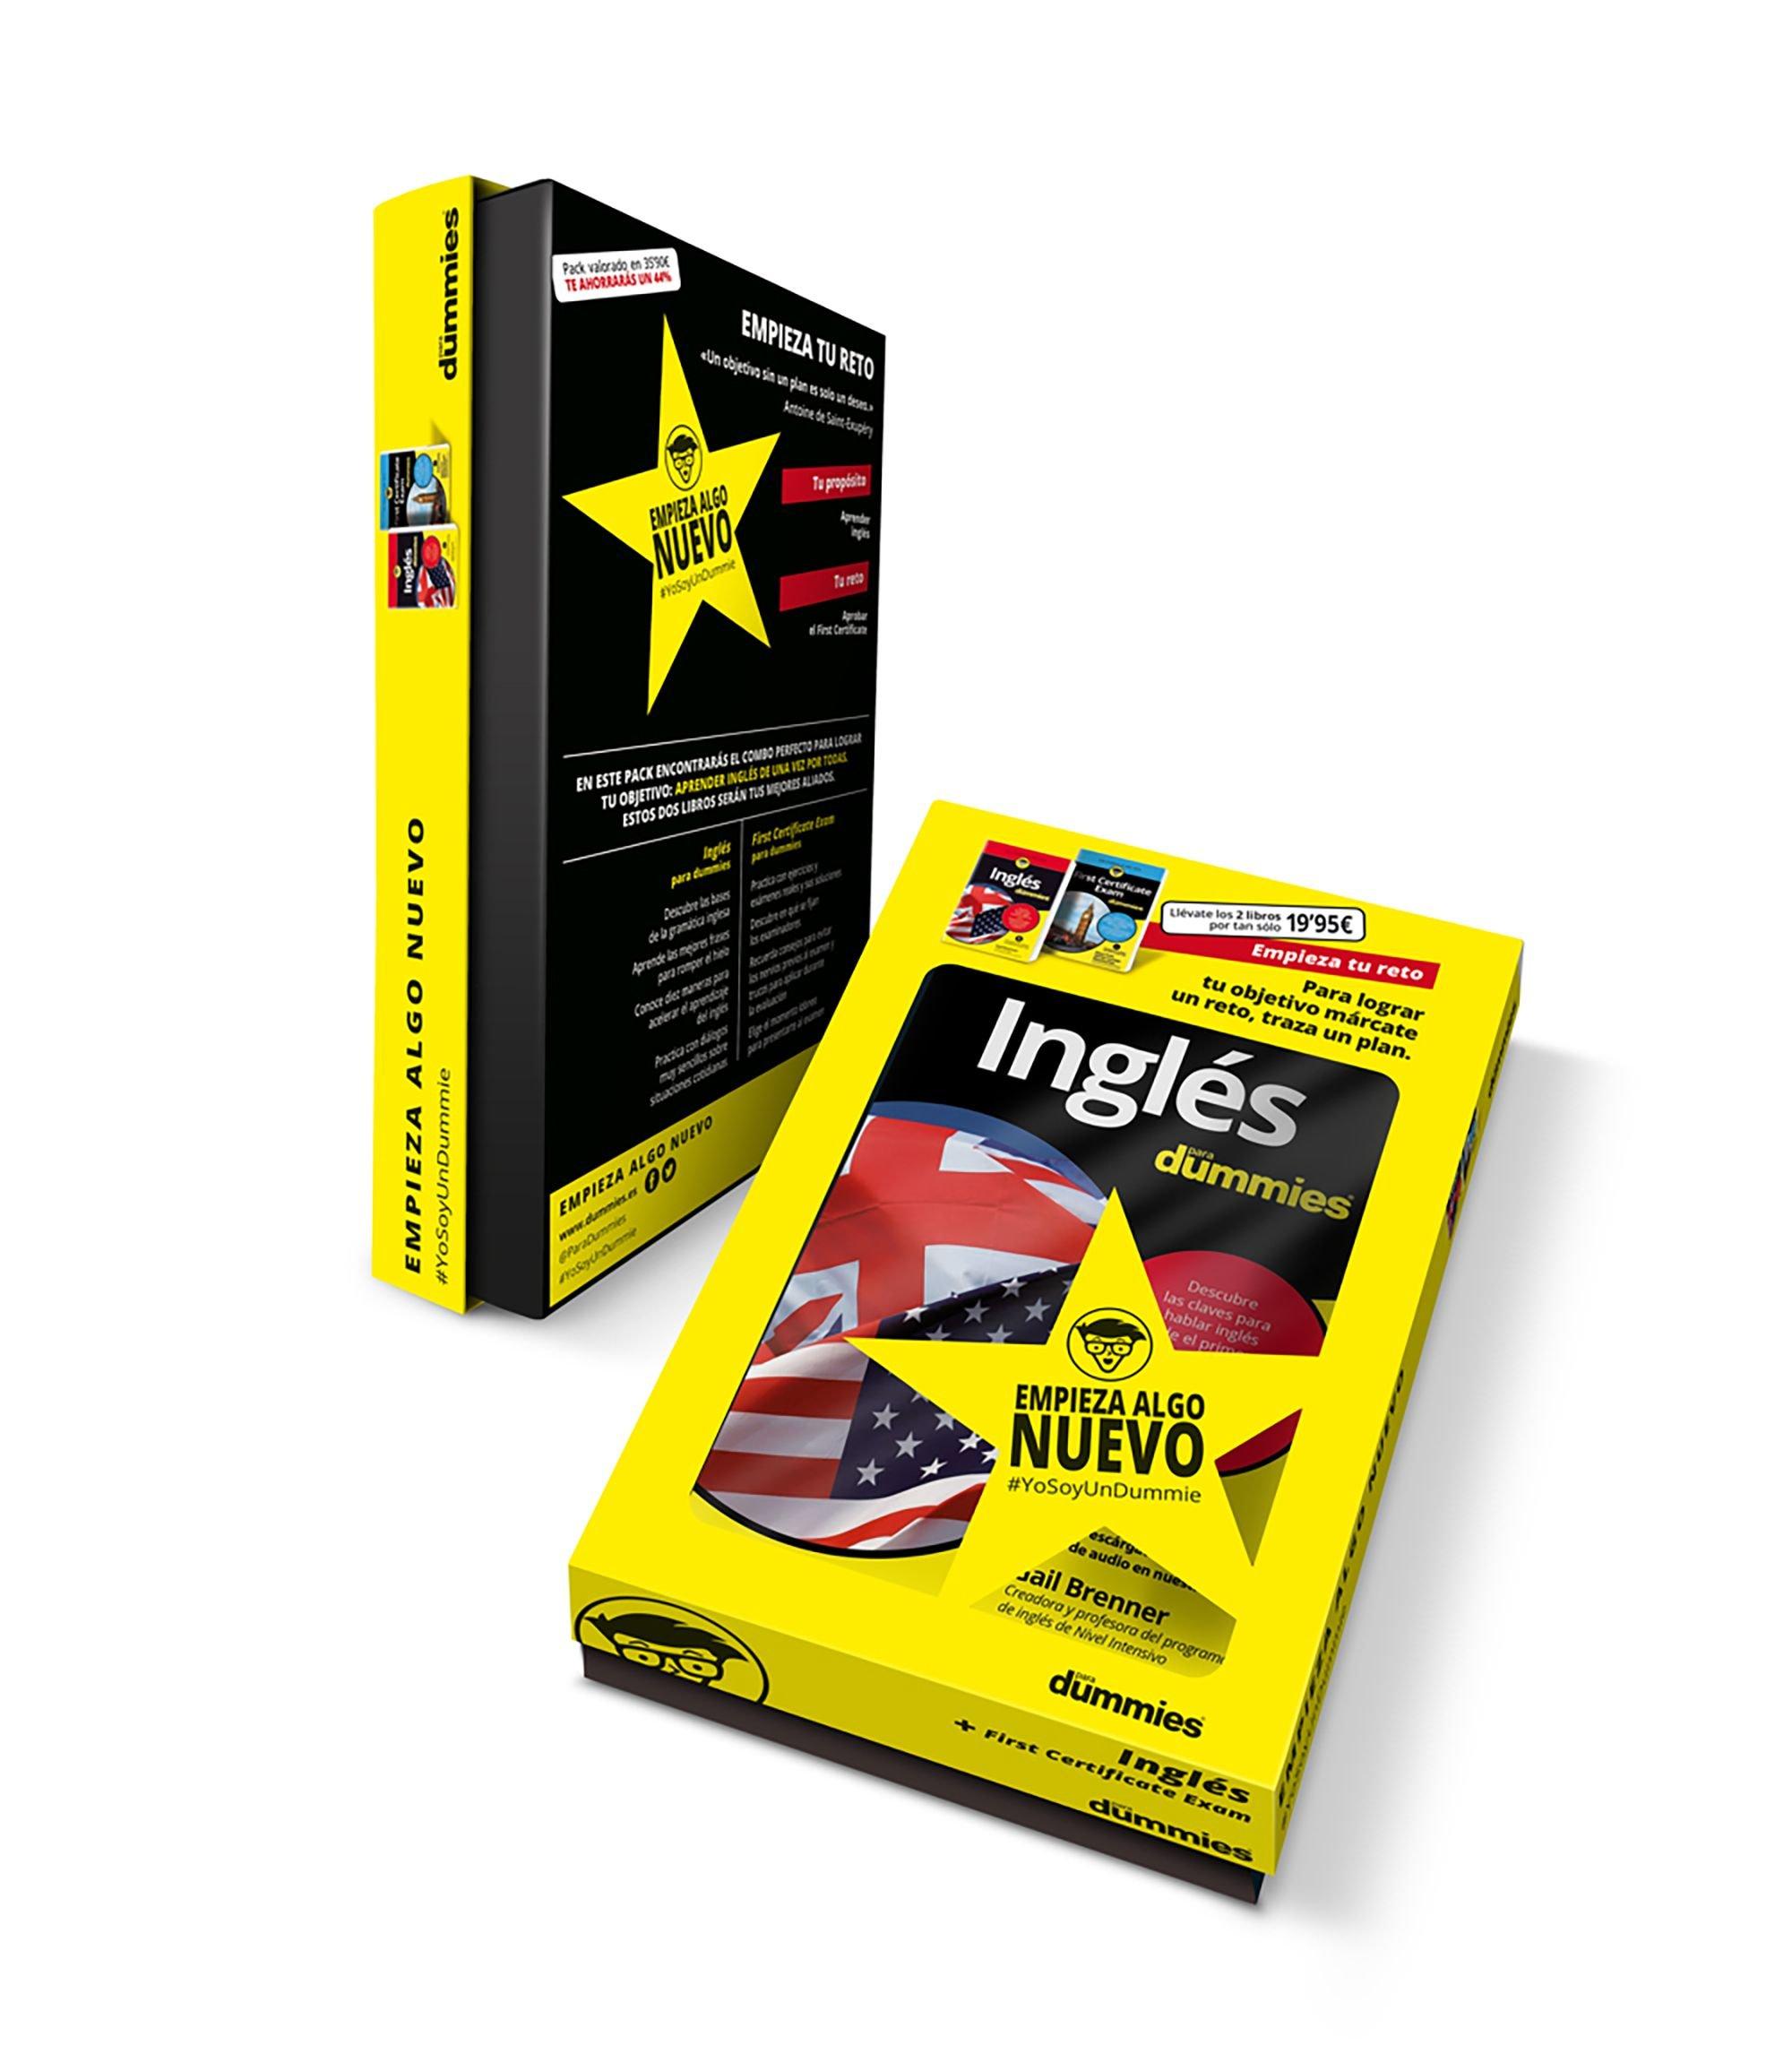 Pack Inglés para Dummies #EmpiezaTuReto: Amazon.es: AA. VV.: Libros